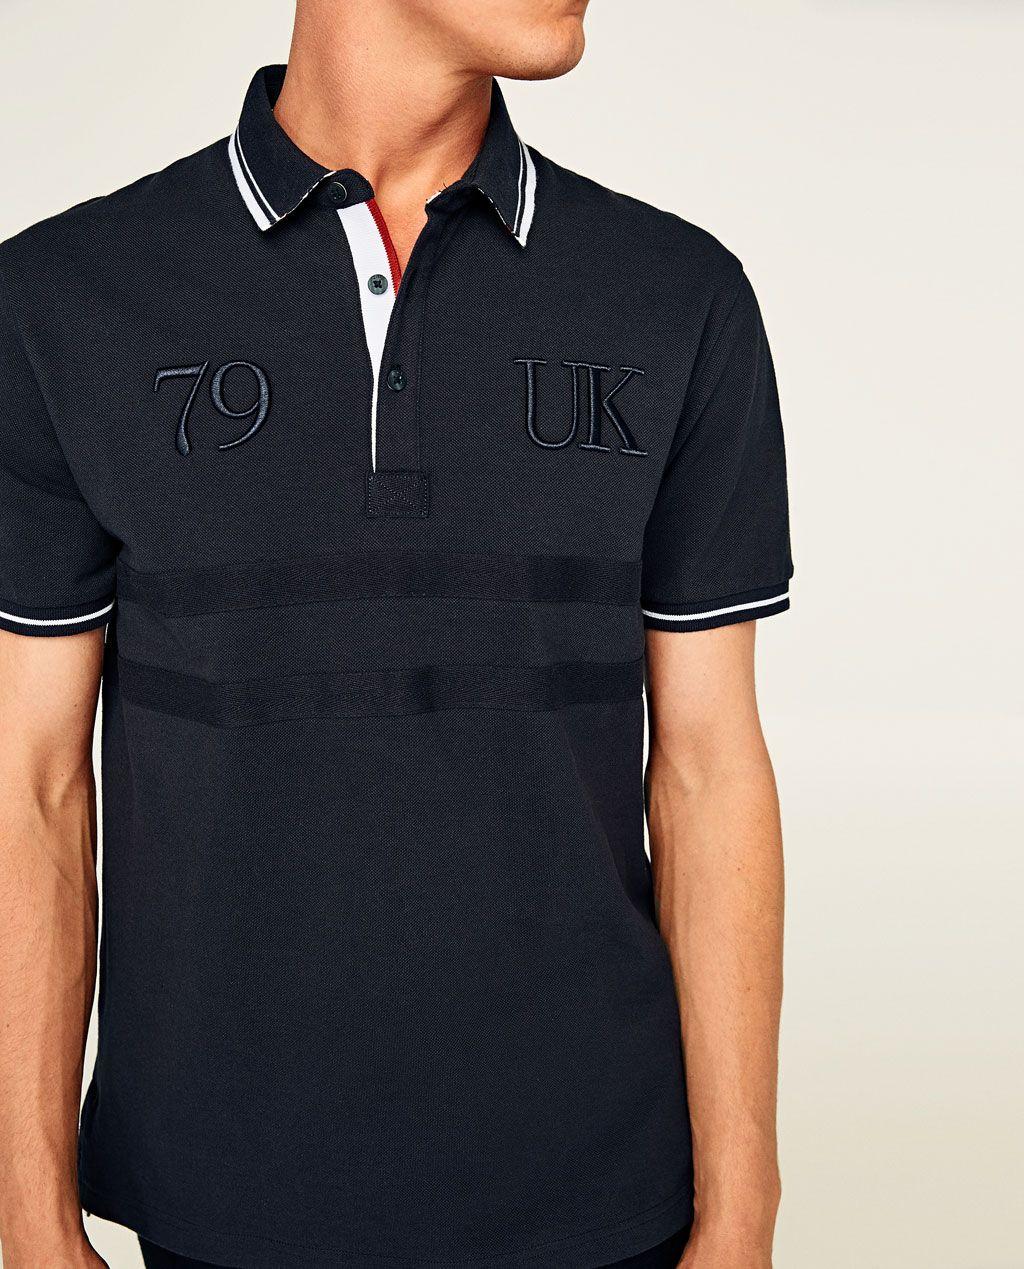 Polo Shirt With Embroidered Countries Polos Man Zara United States Polo Shirt Polo Boys Tracksuits